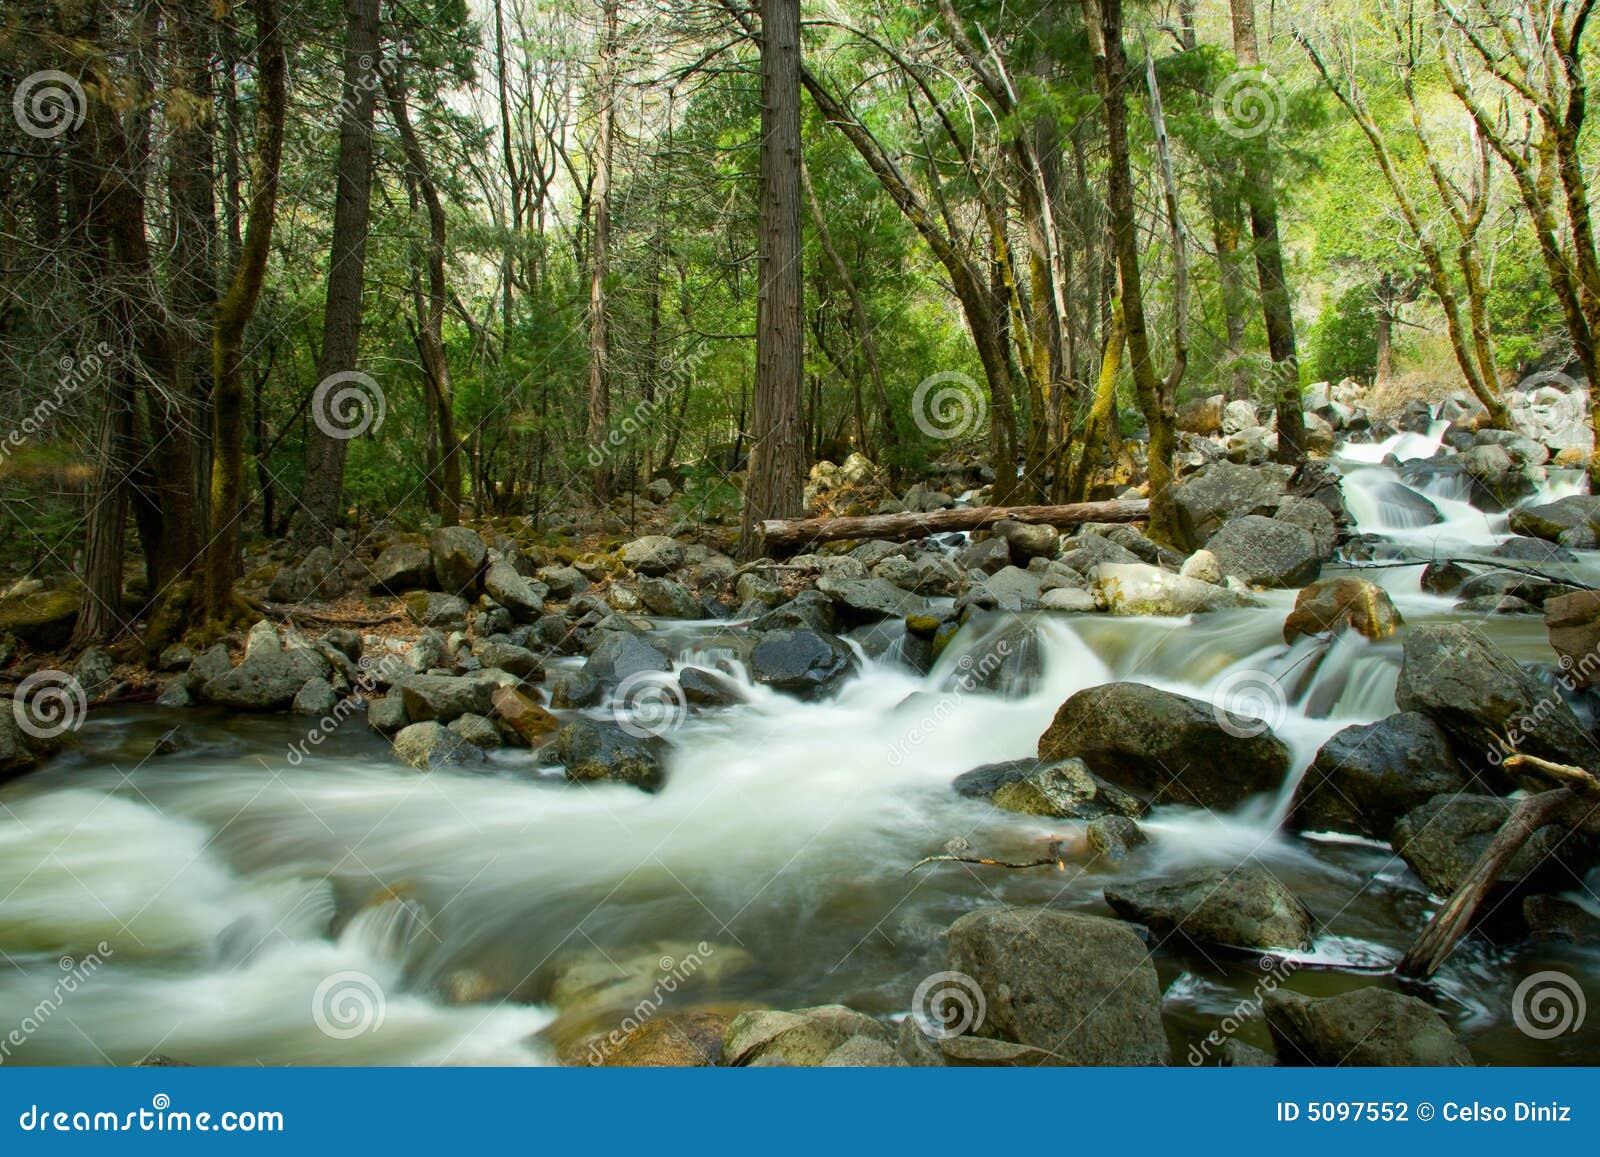 Toneelmening die van rivier over rotsen in bos, het nationale park van